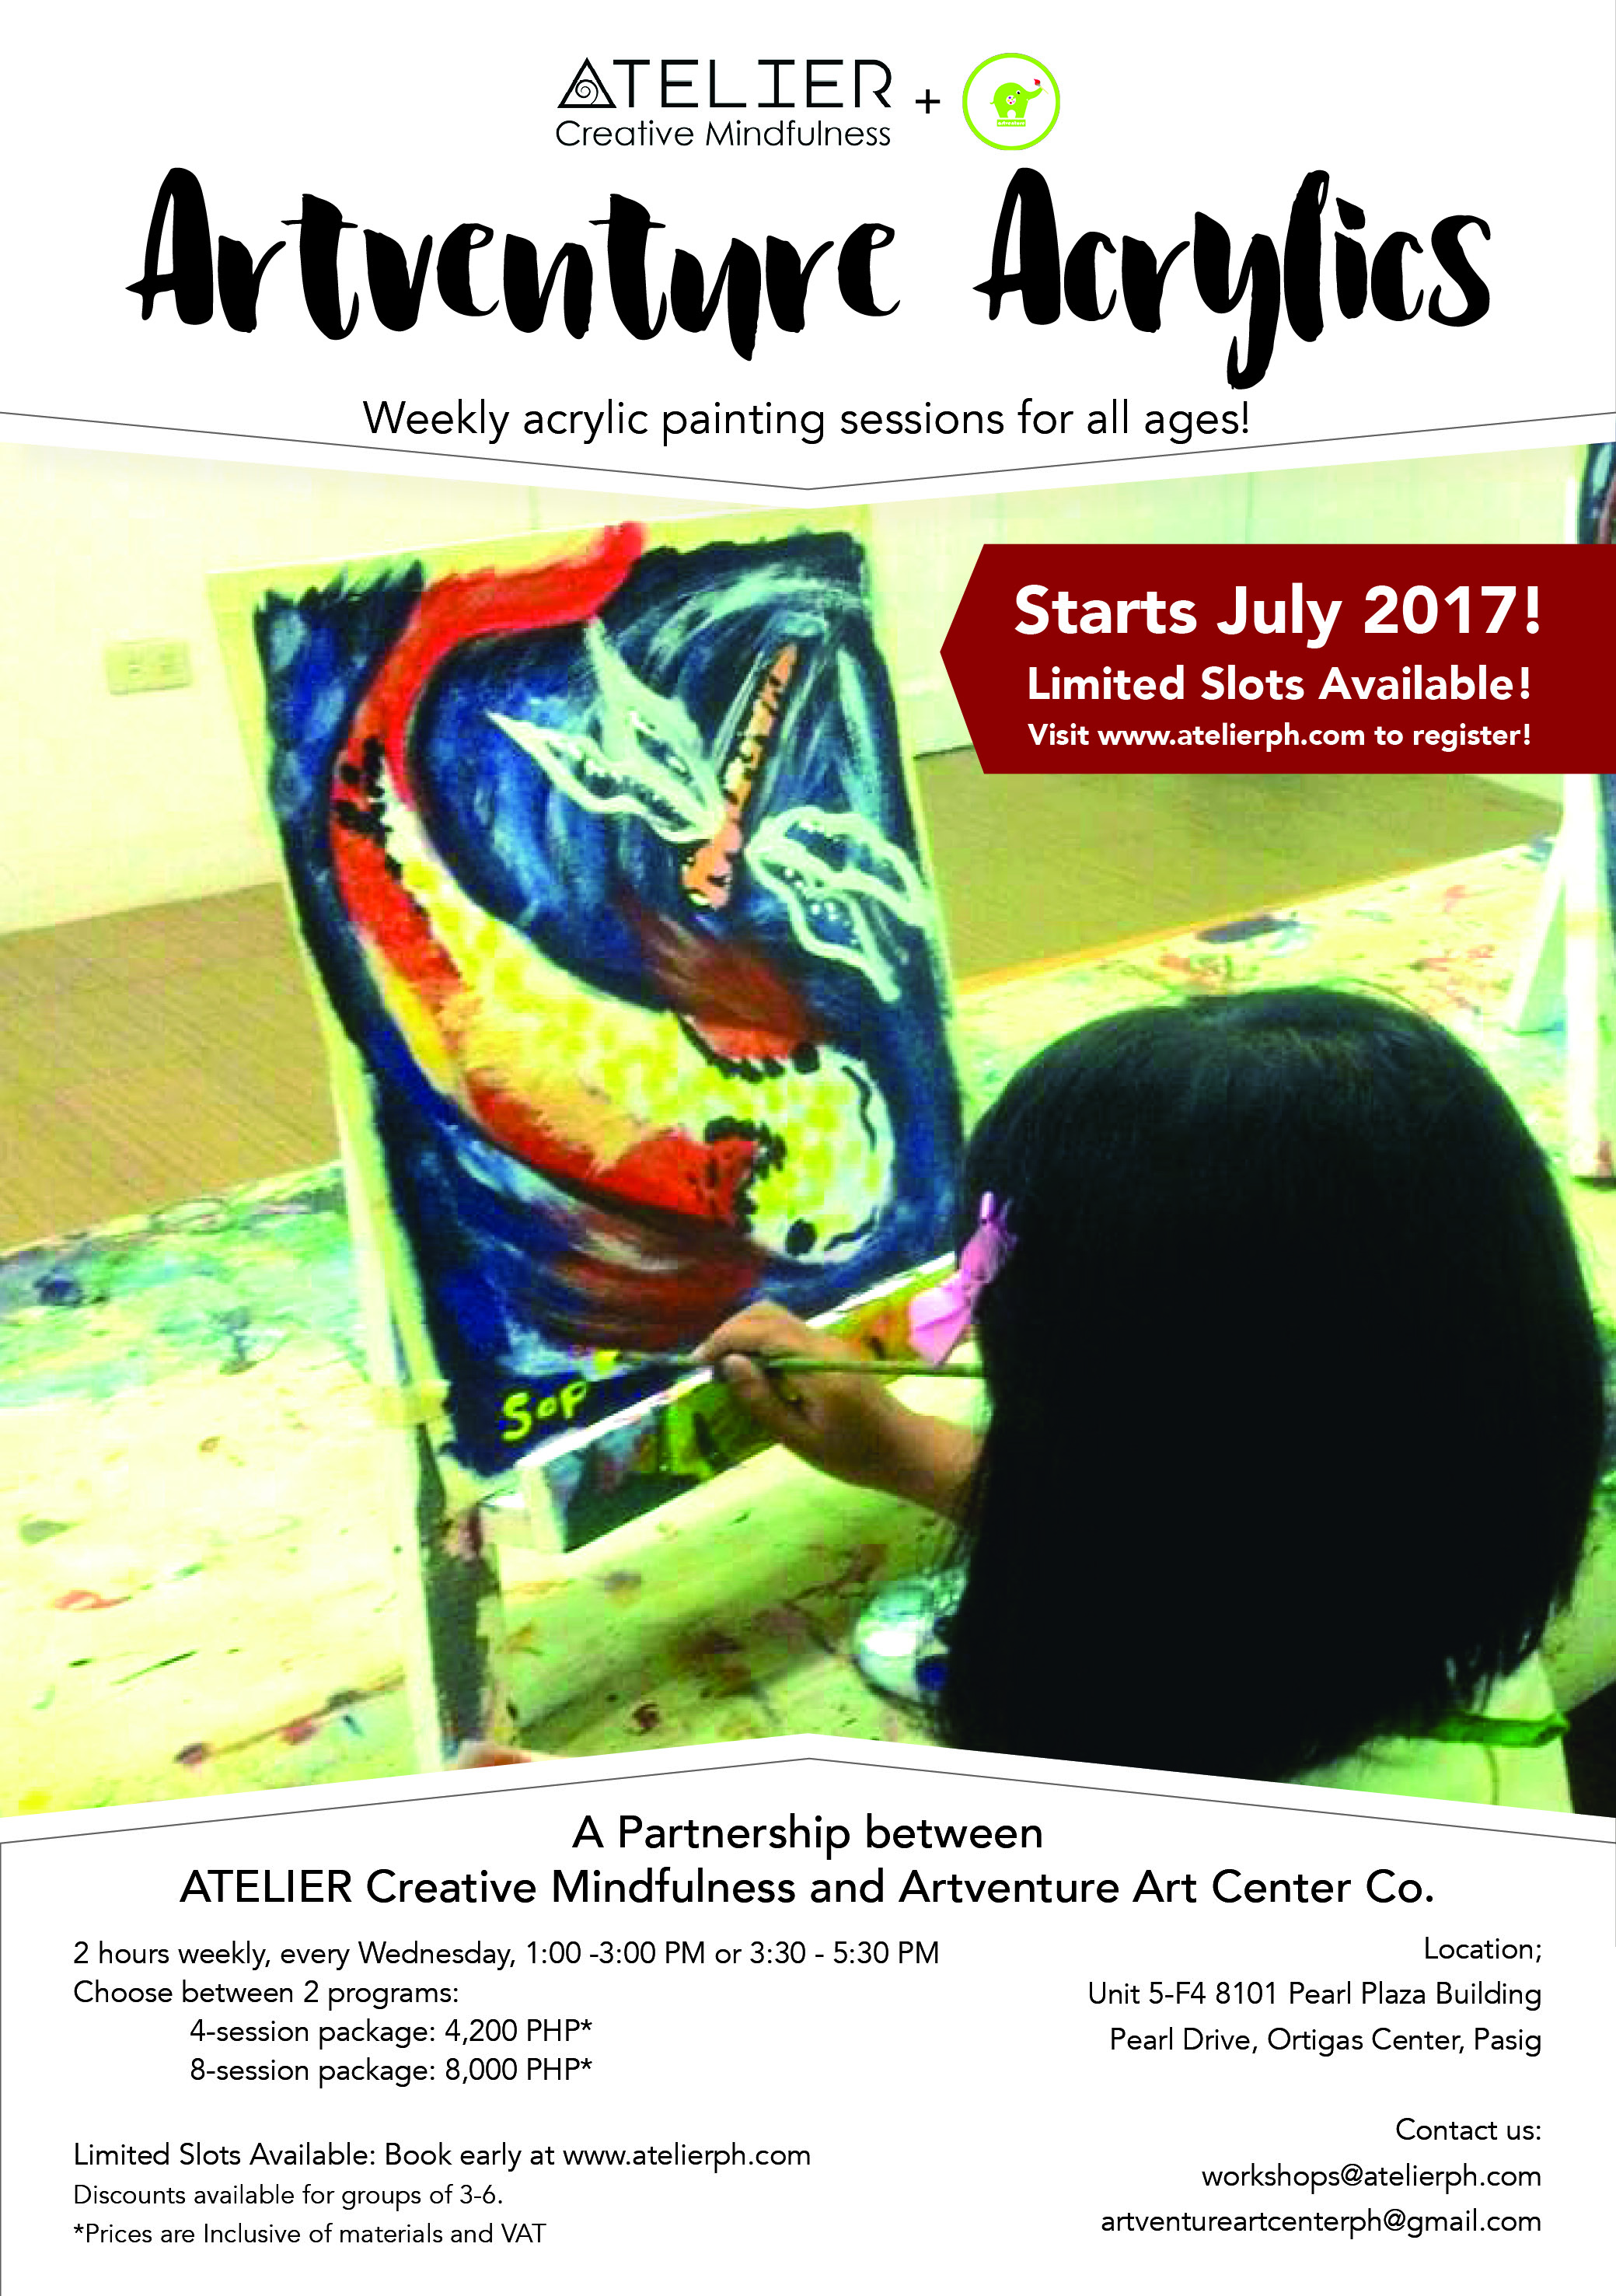 Artventure Workshop Promos